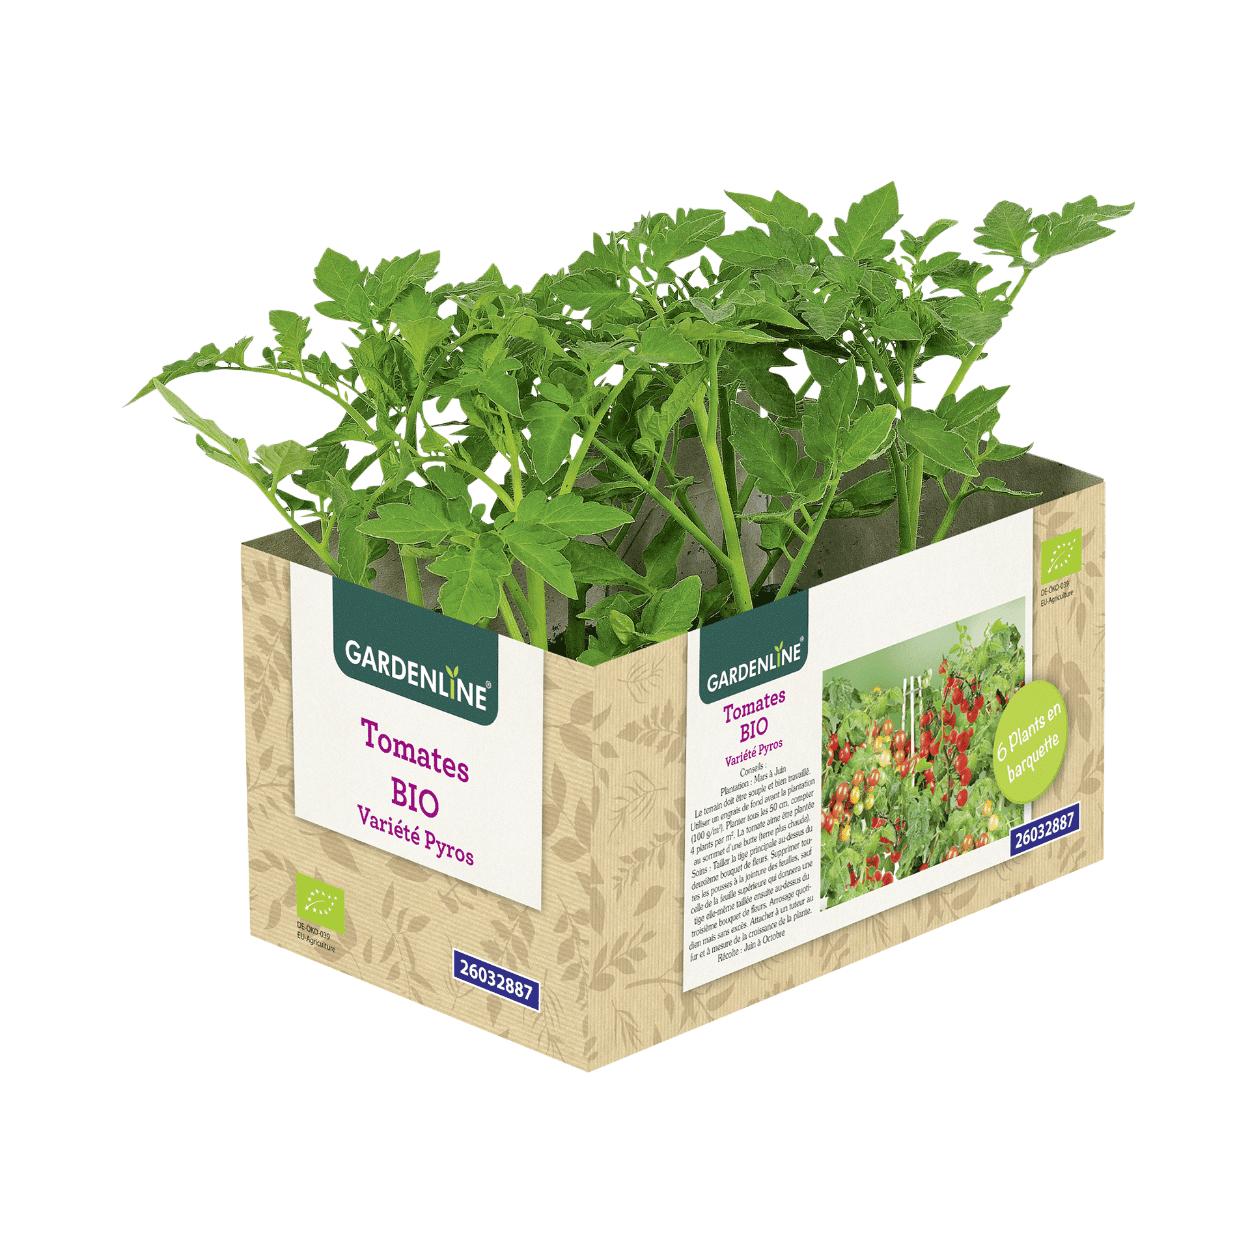 6 Plants de légumes bio Gardenline